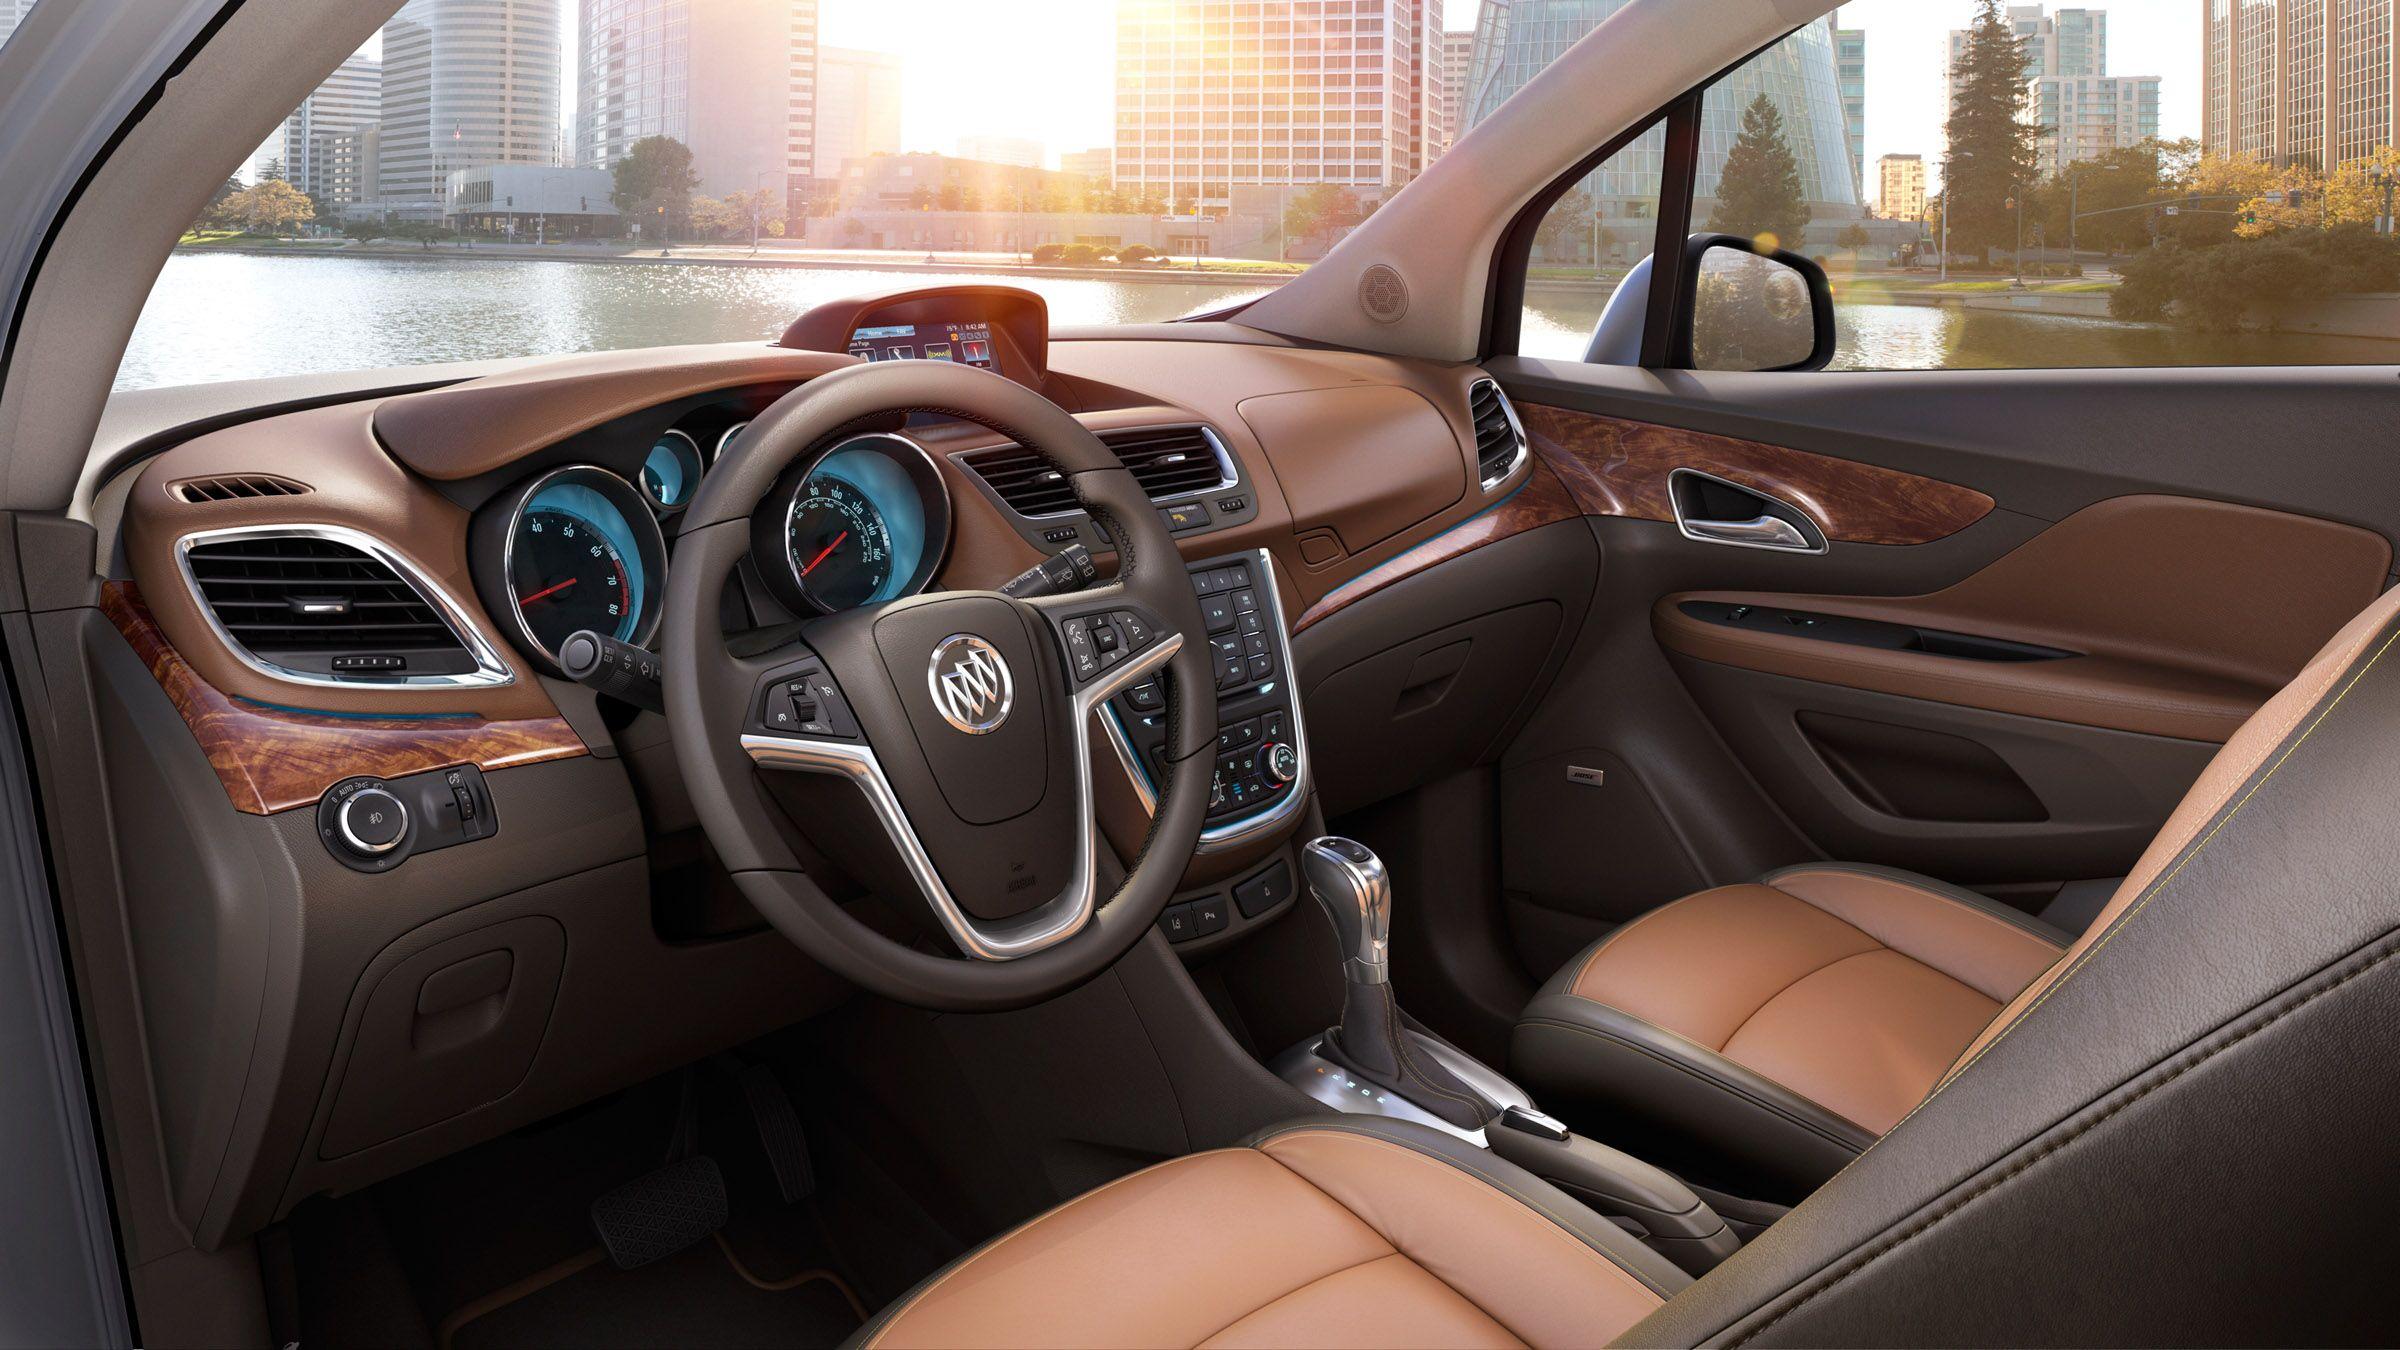 2013 Buick Encore Interior Top 10 Best Gas Mileage Suvs 2014 Buick Encore 2015 Buick Buick Enclave